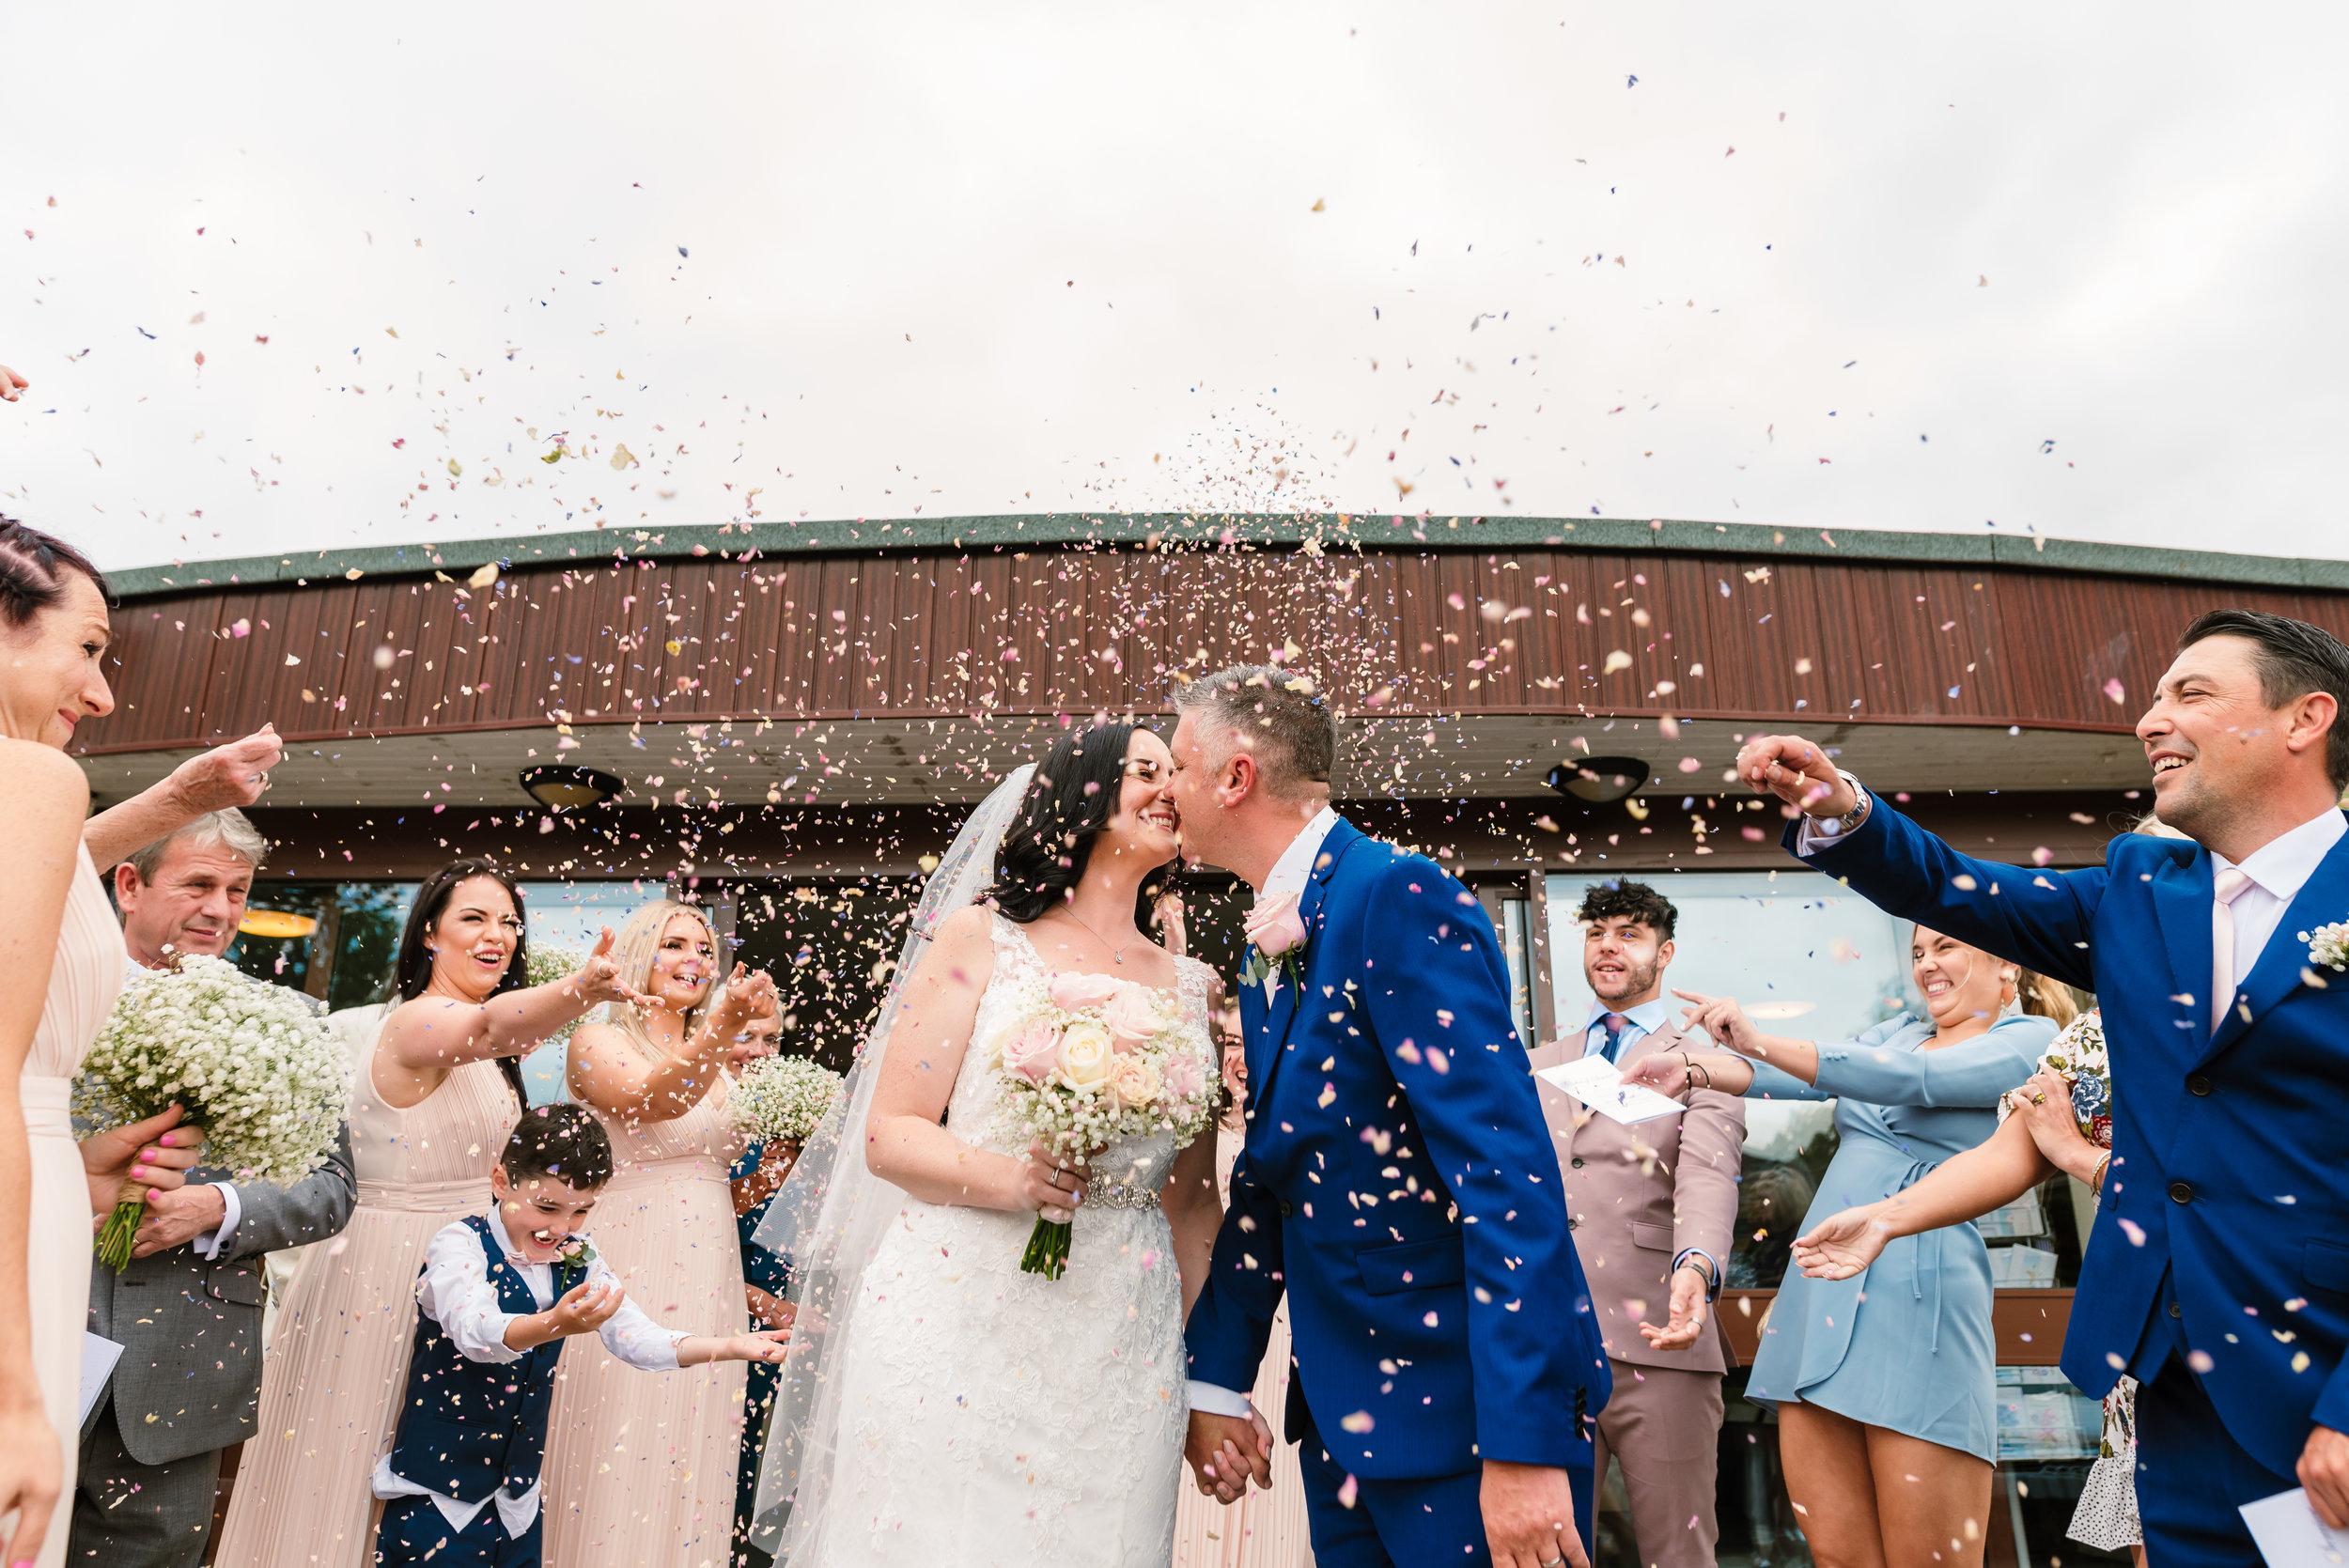 Sarah-Fishlock-Photography : Hampshire-wedding-photographer-hampshire : fleet-wedding-photographer-fleet : Meade-Hall-Wedding-Photographer : Meade-Hall-Wedding-Photos-562.jpg